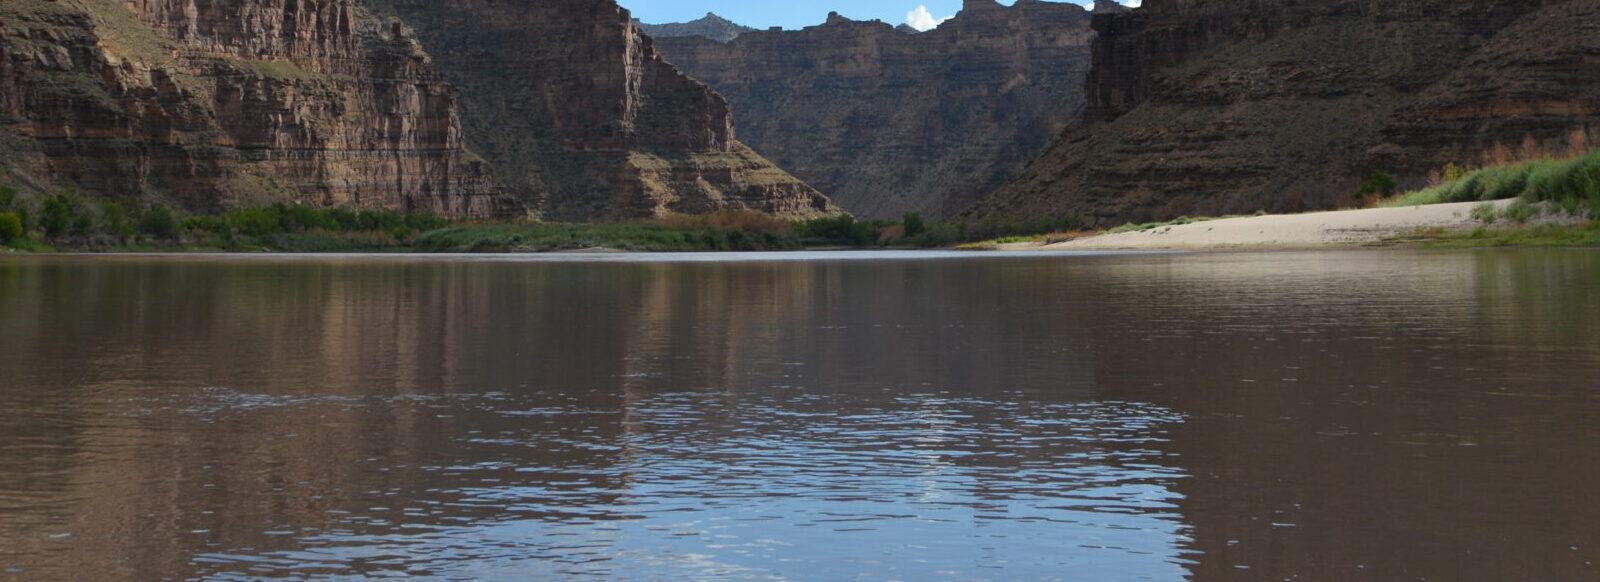 Desolation Canyon | Photo by the Bureau of Land Management